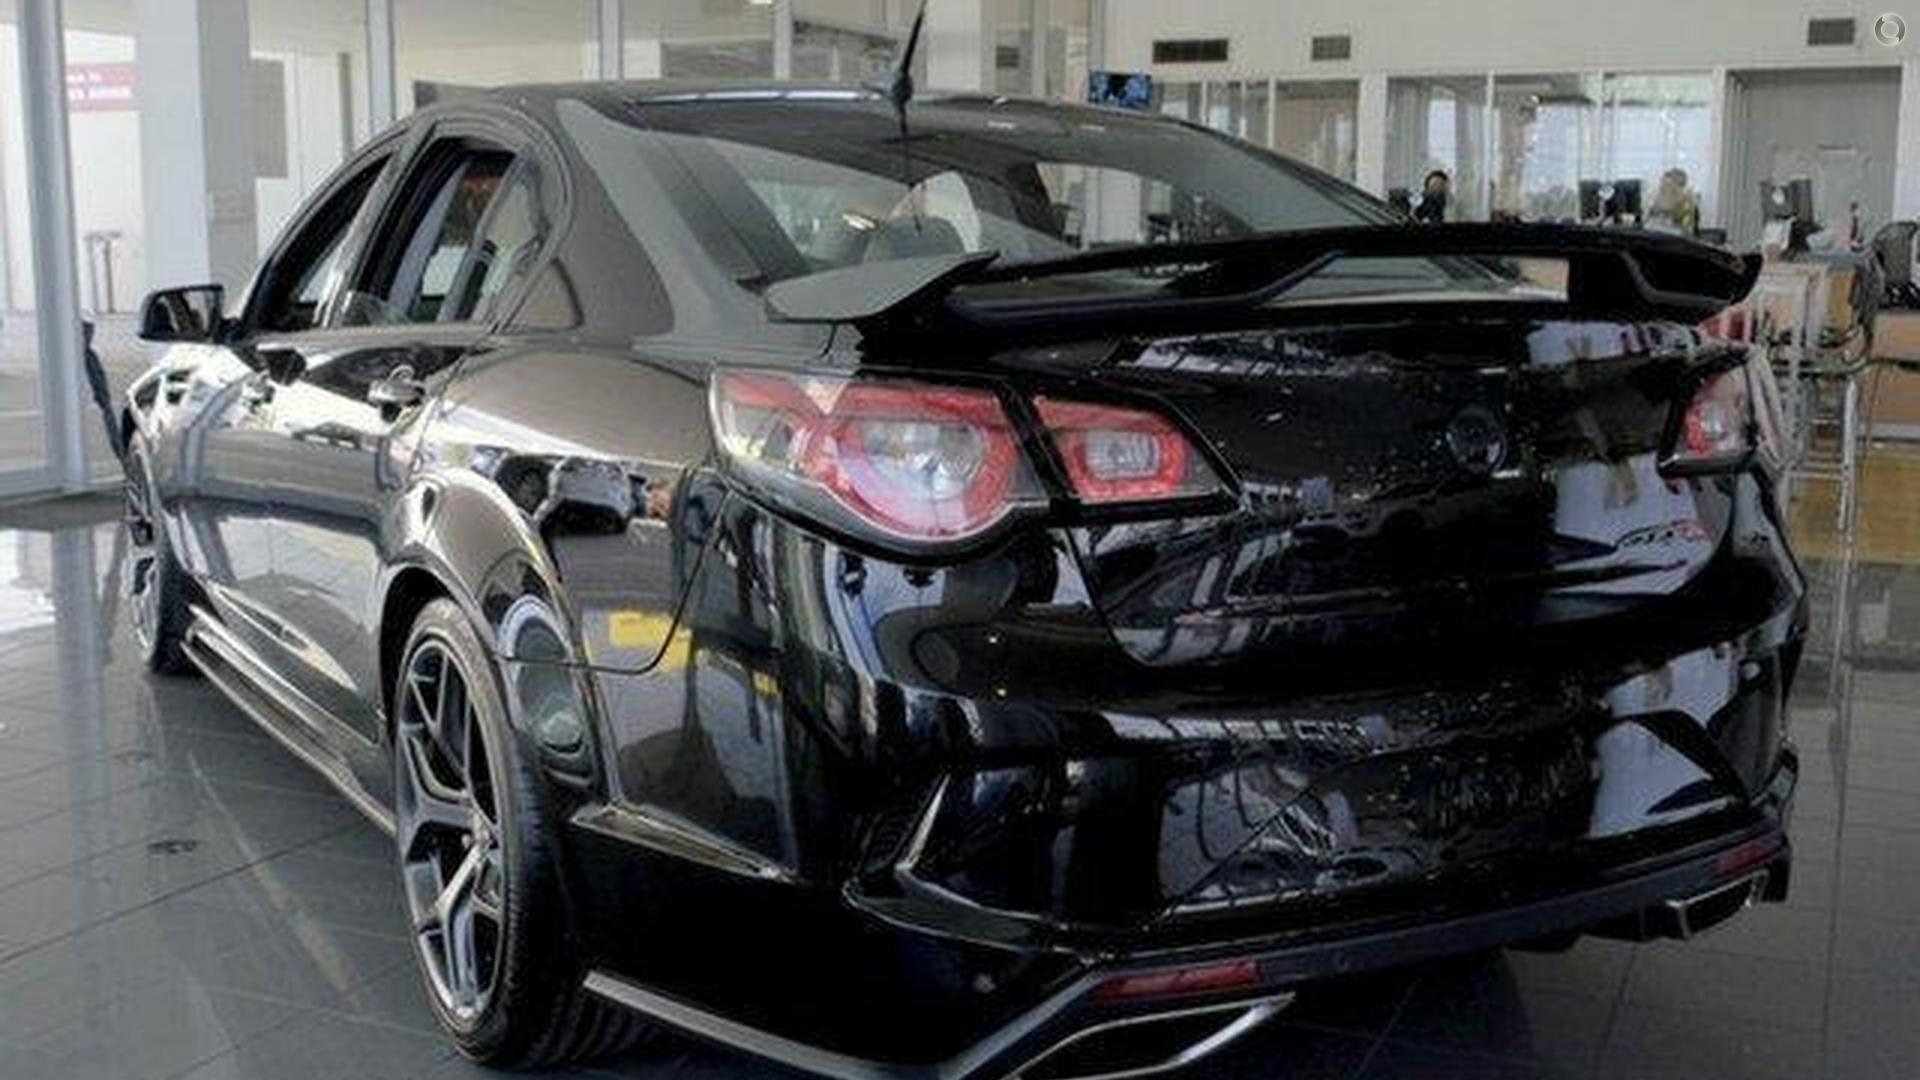 2017 Holden Special Vehicles Gts R GEN-F2